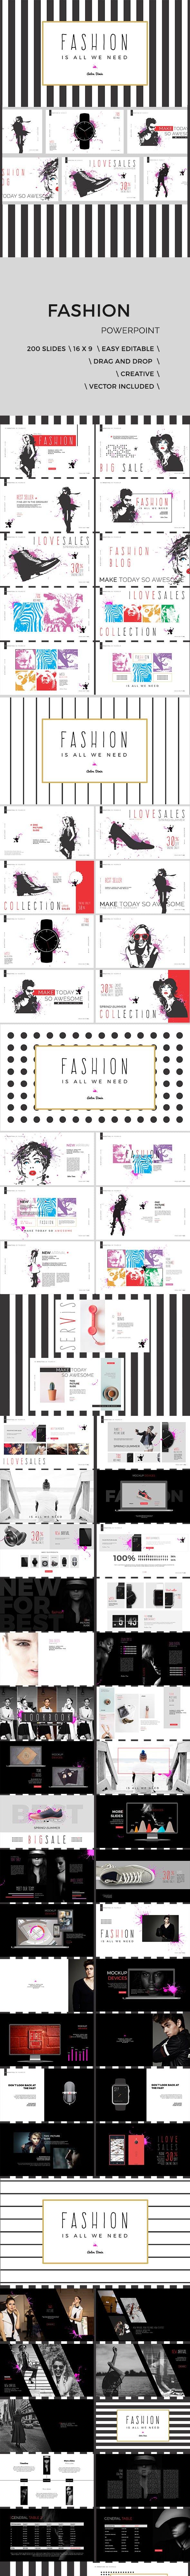 art fashion powerpoint presentation by diminanton graphicriver